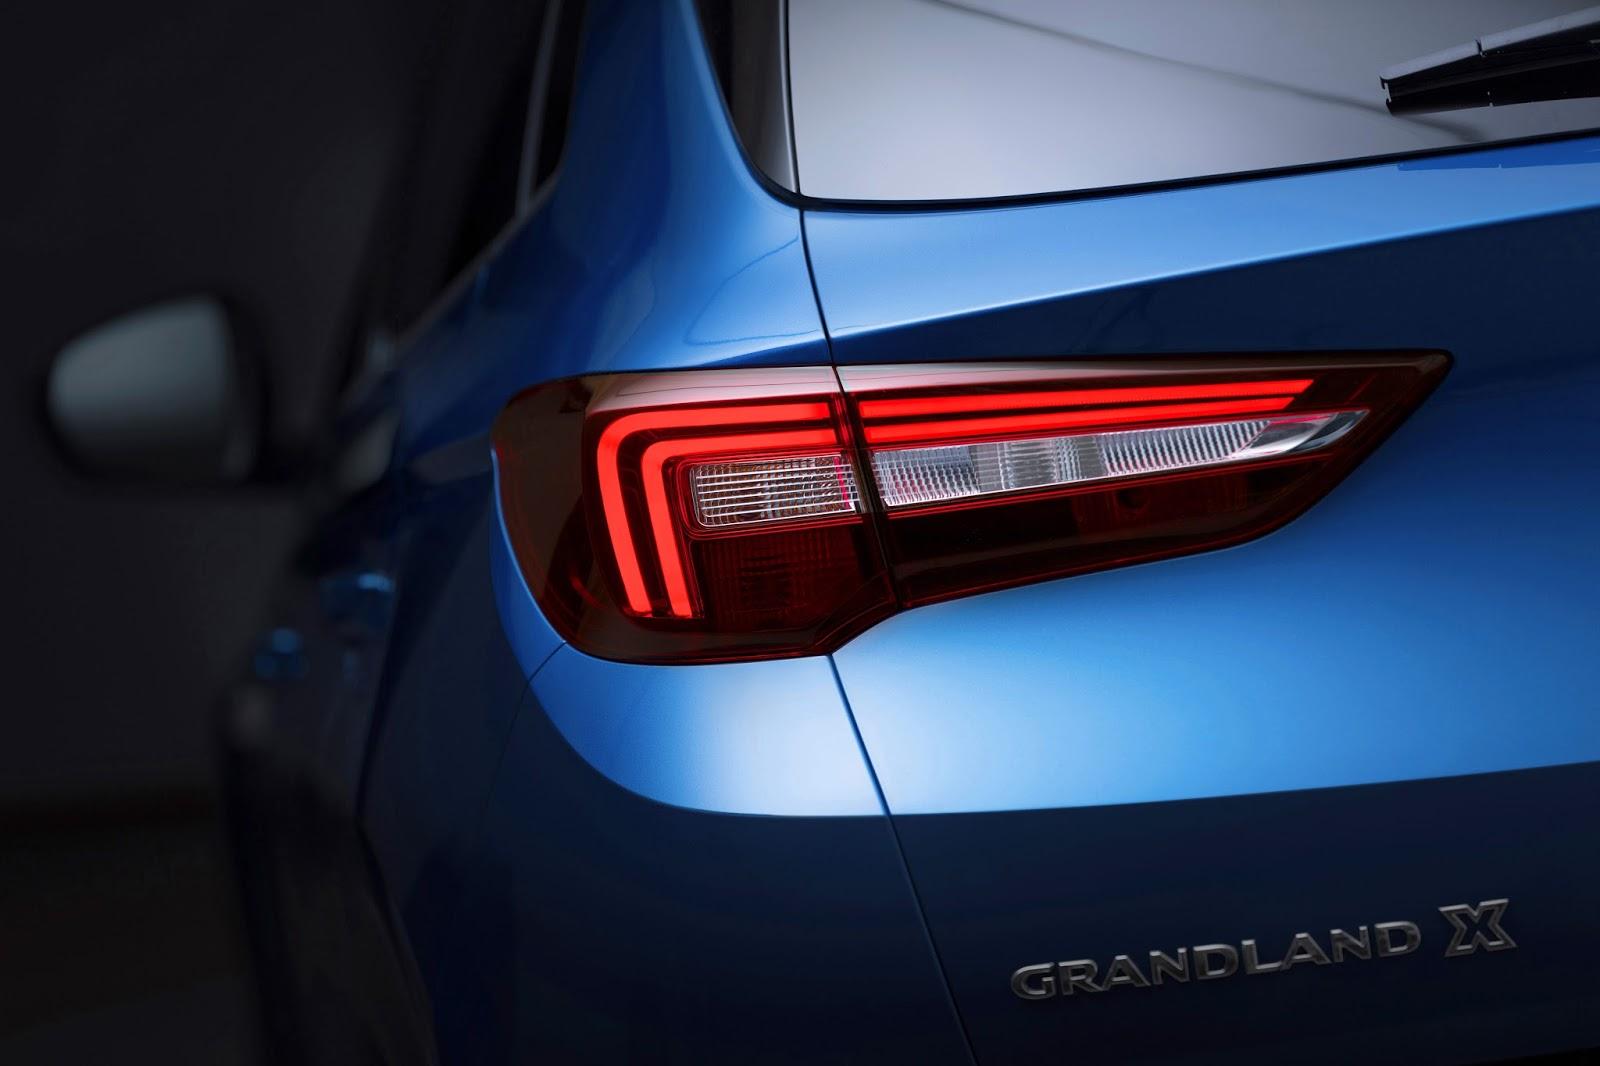 Opel Grandland X 305591 Το μεγάλο SUV της Opel, το Grandland X, έρχεται το φθινόπωρο Opel, Opel Grandland, Opel Grandland X, SUV, videos, Λανσάρισμα